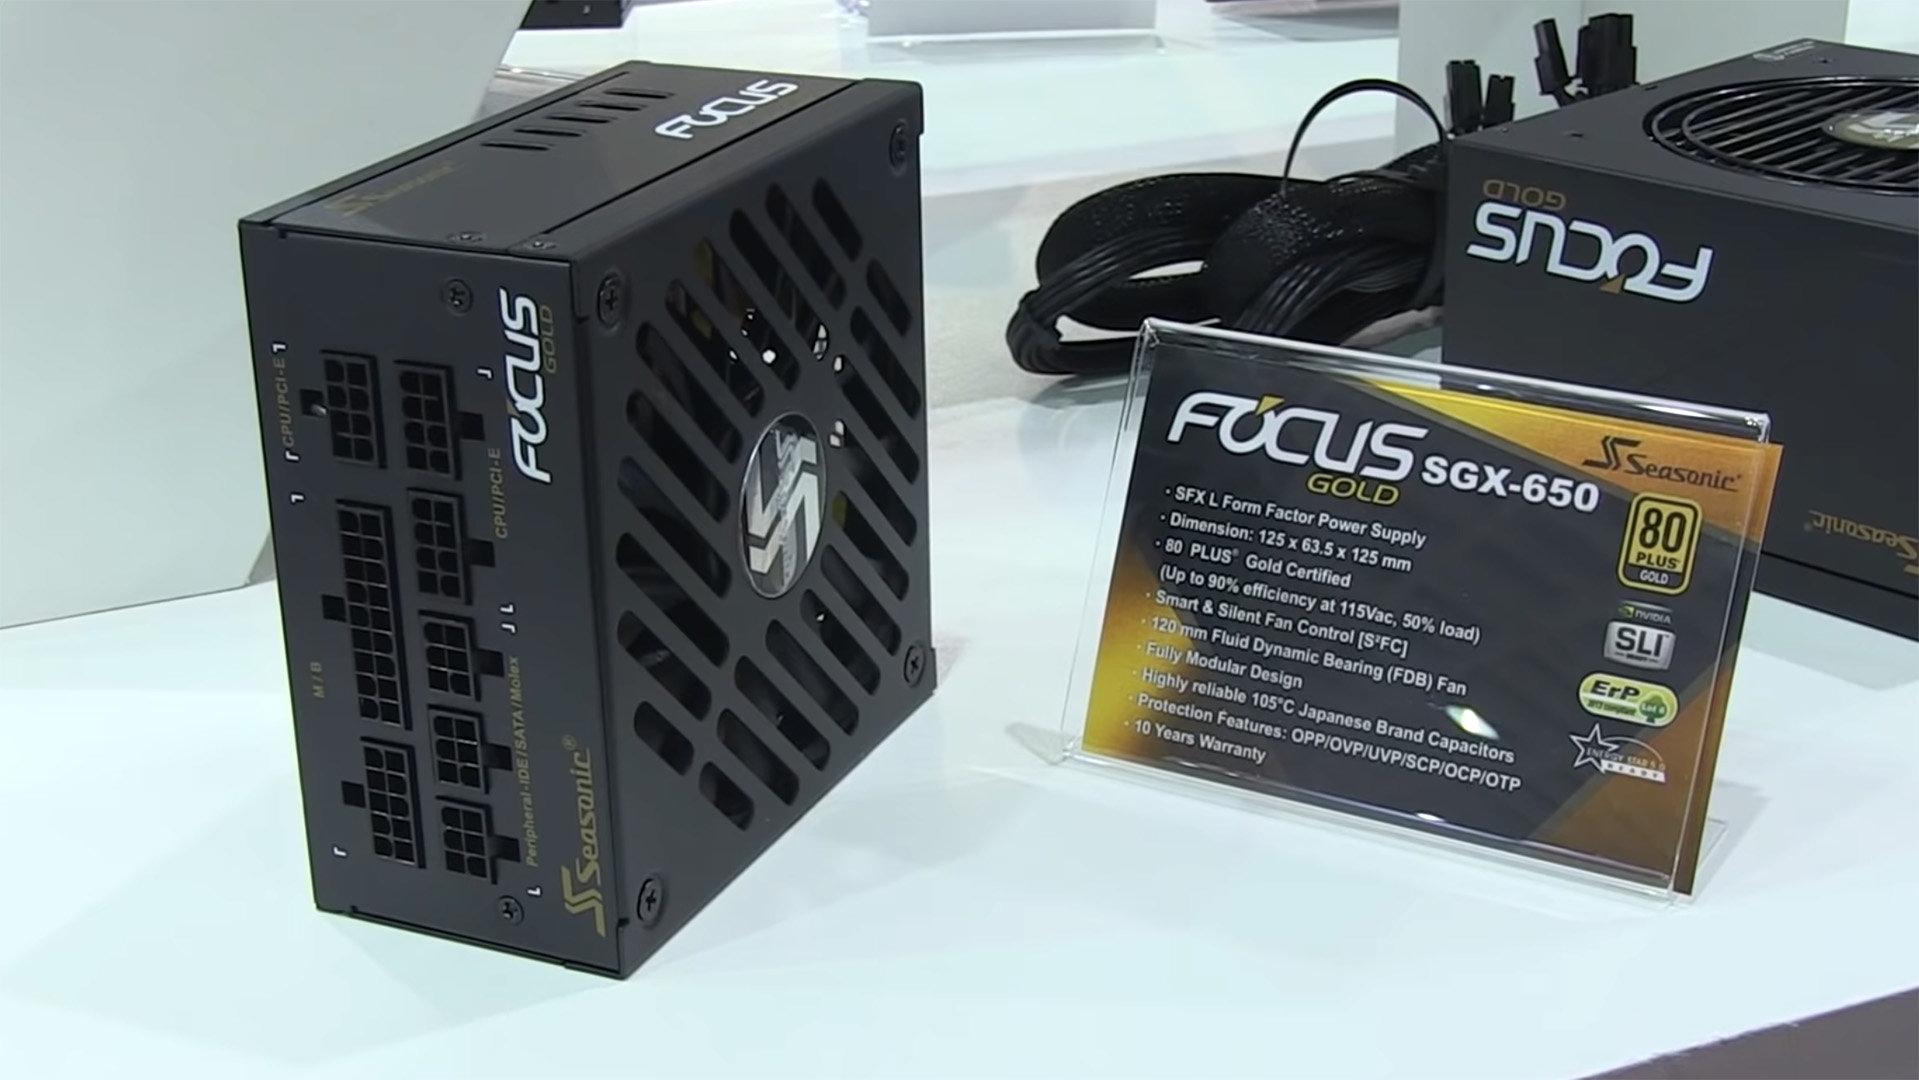 Sea Sonic Focus Gold SXG-650